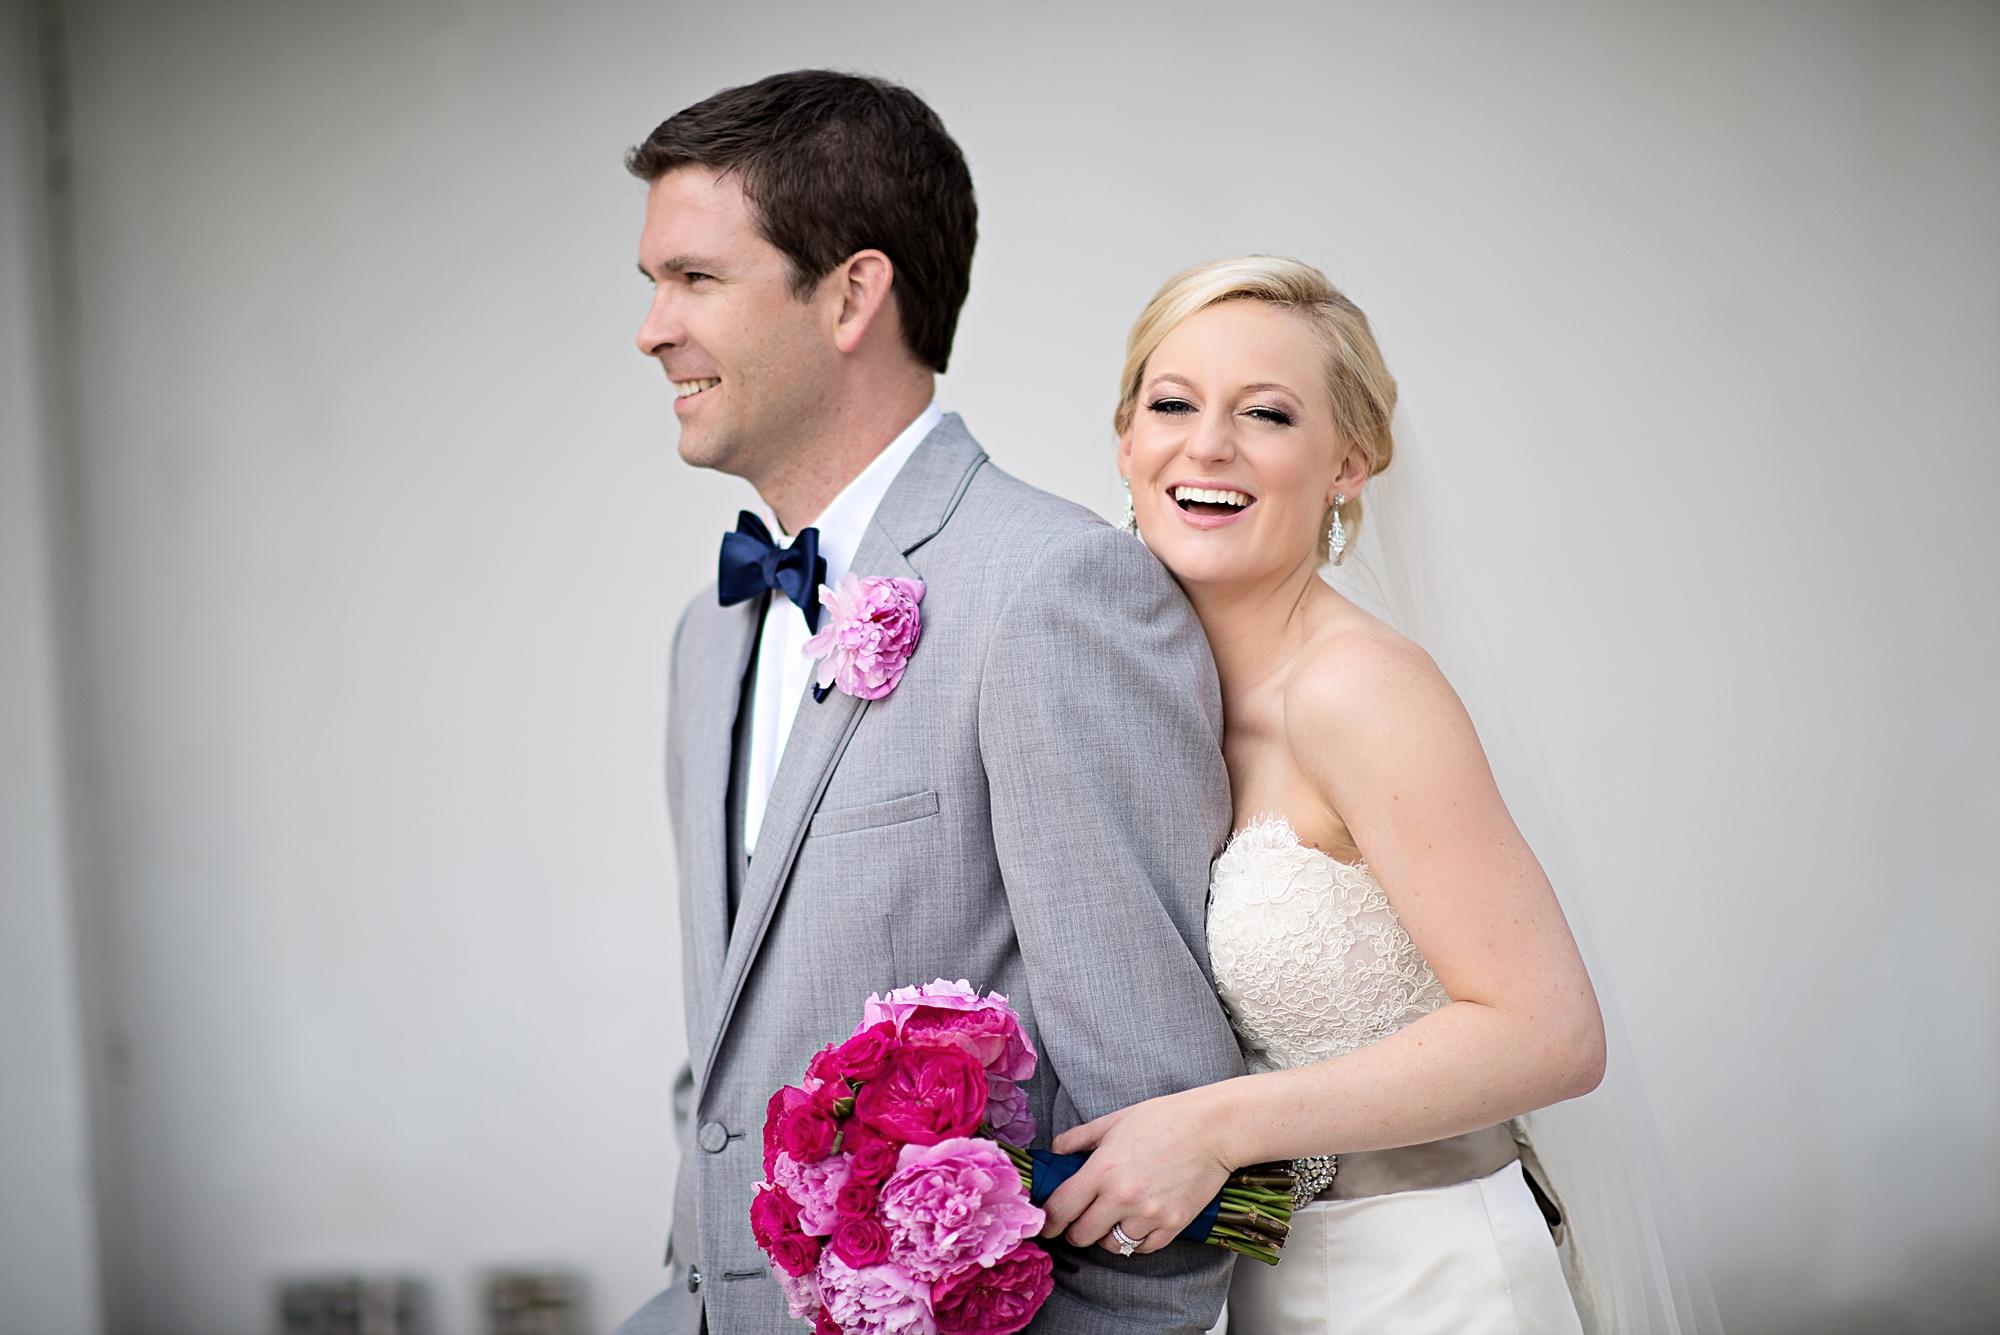 vinoy wedding photographer